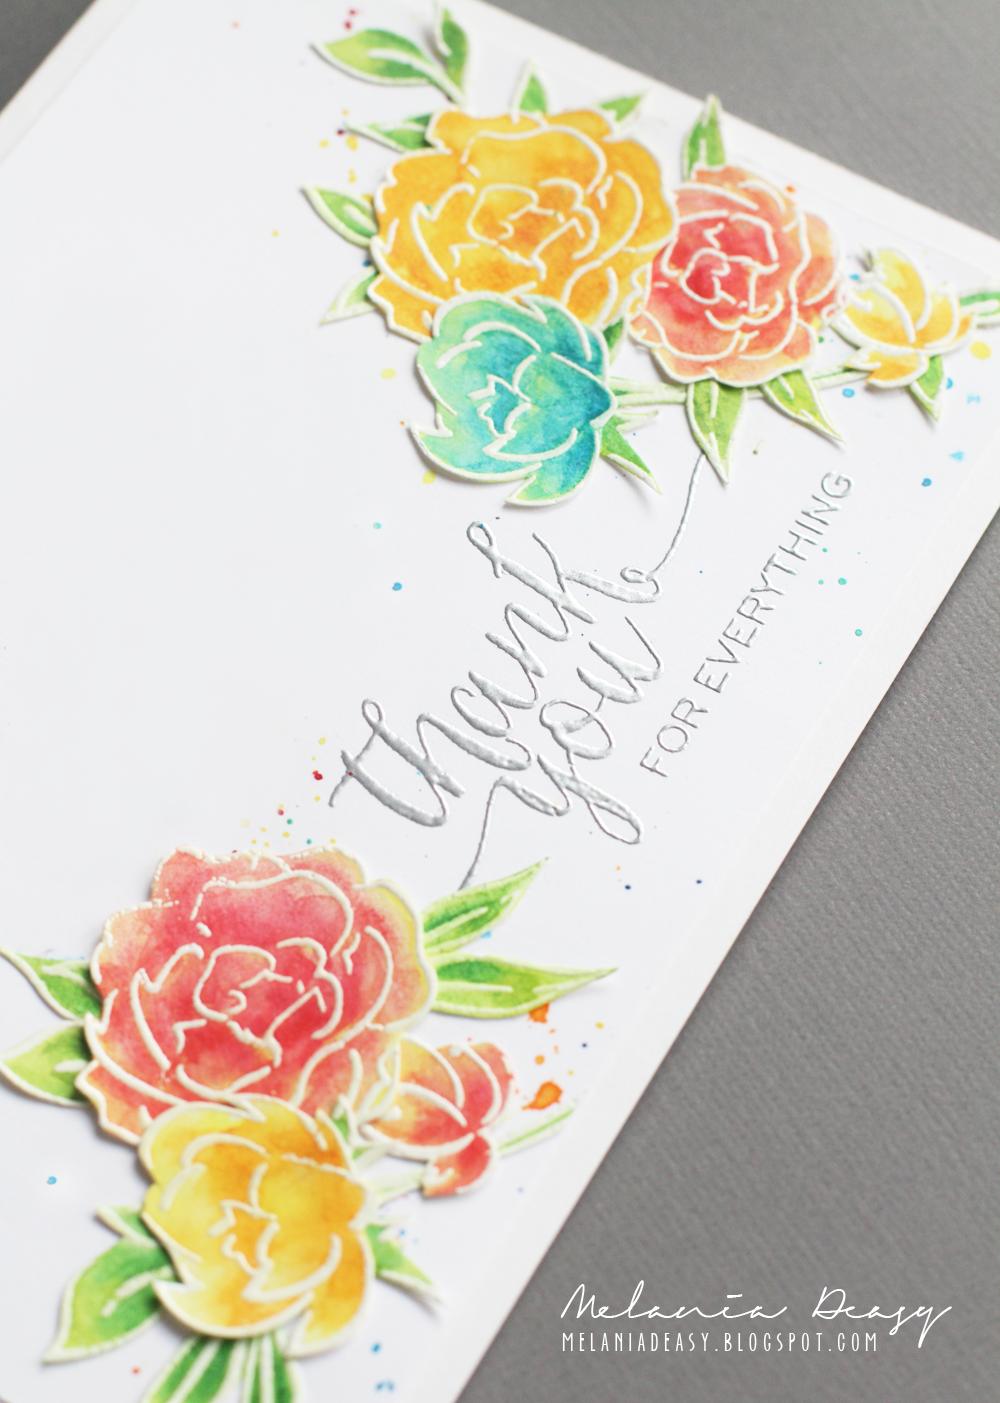 Paper Crafts & Scrapbooking Special Thanks Blog Hop